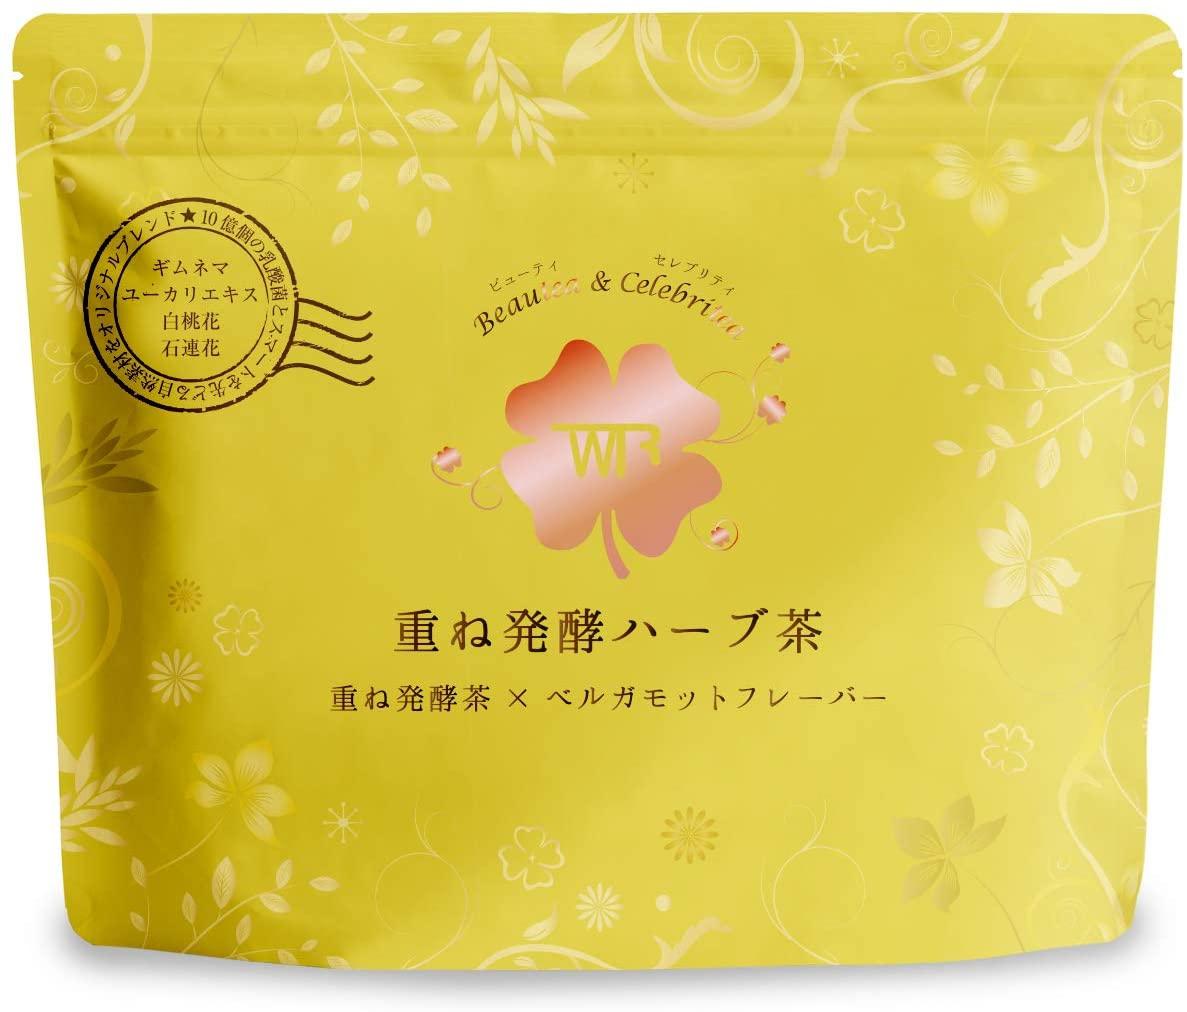 RUBAN BLANC(リュバンブラン) 重ね発酵ハーブ茶